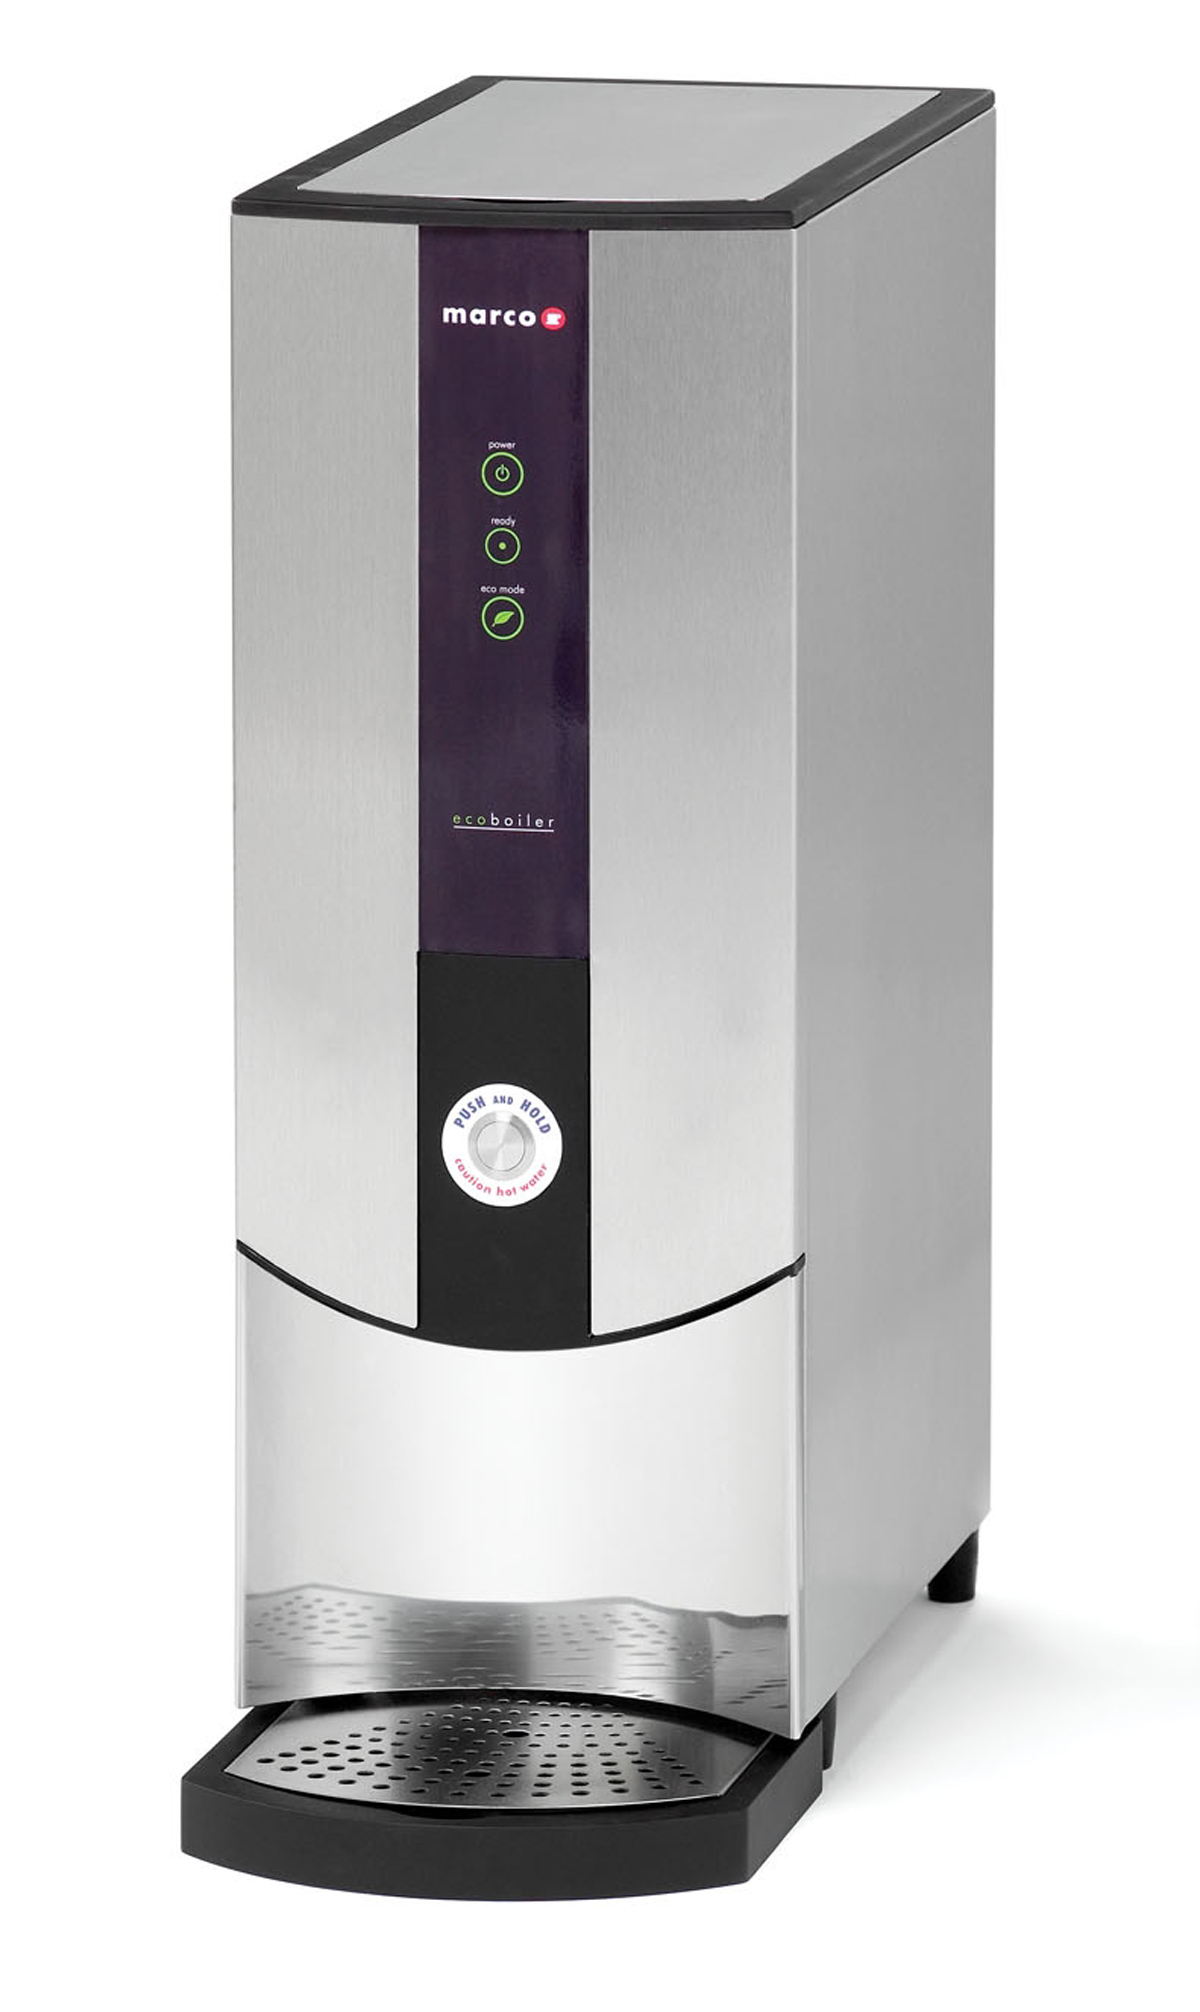 Ecoboiler Pb10 Marco Beverage Systems Ltd